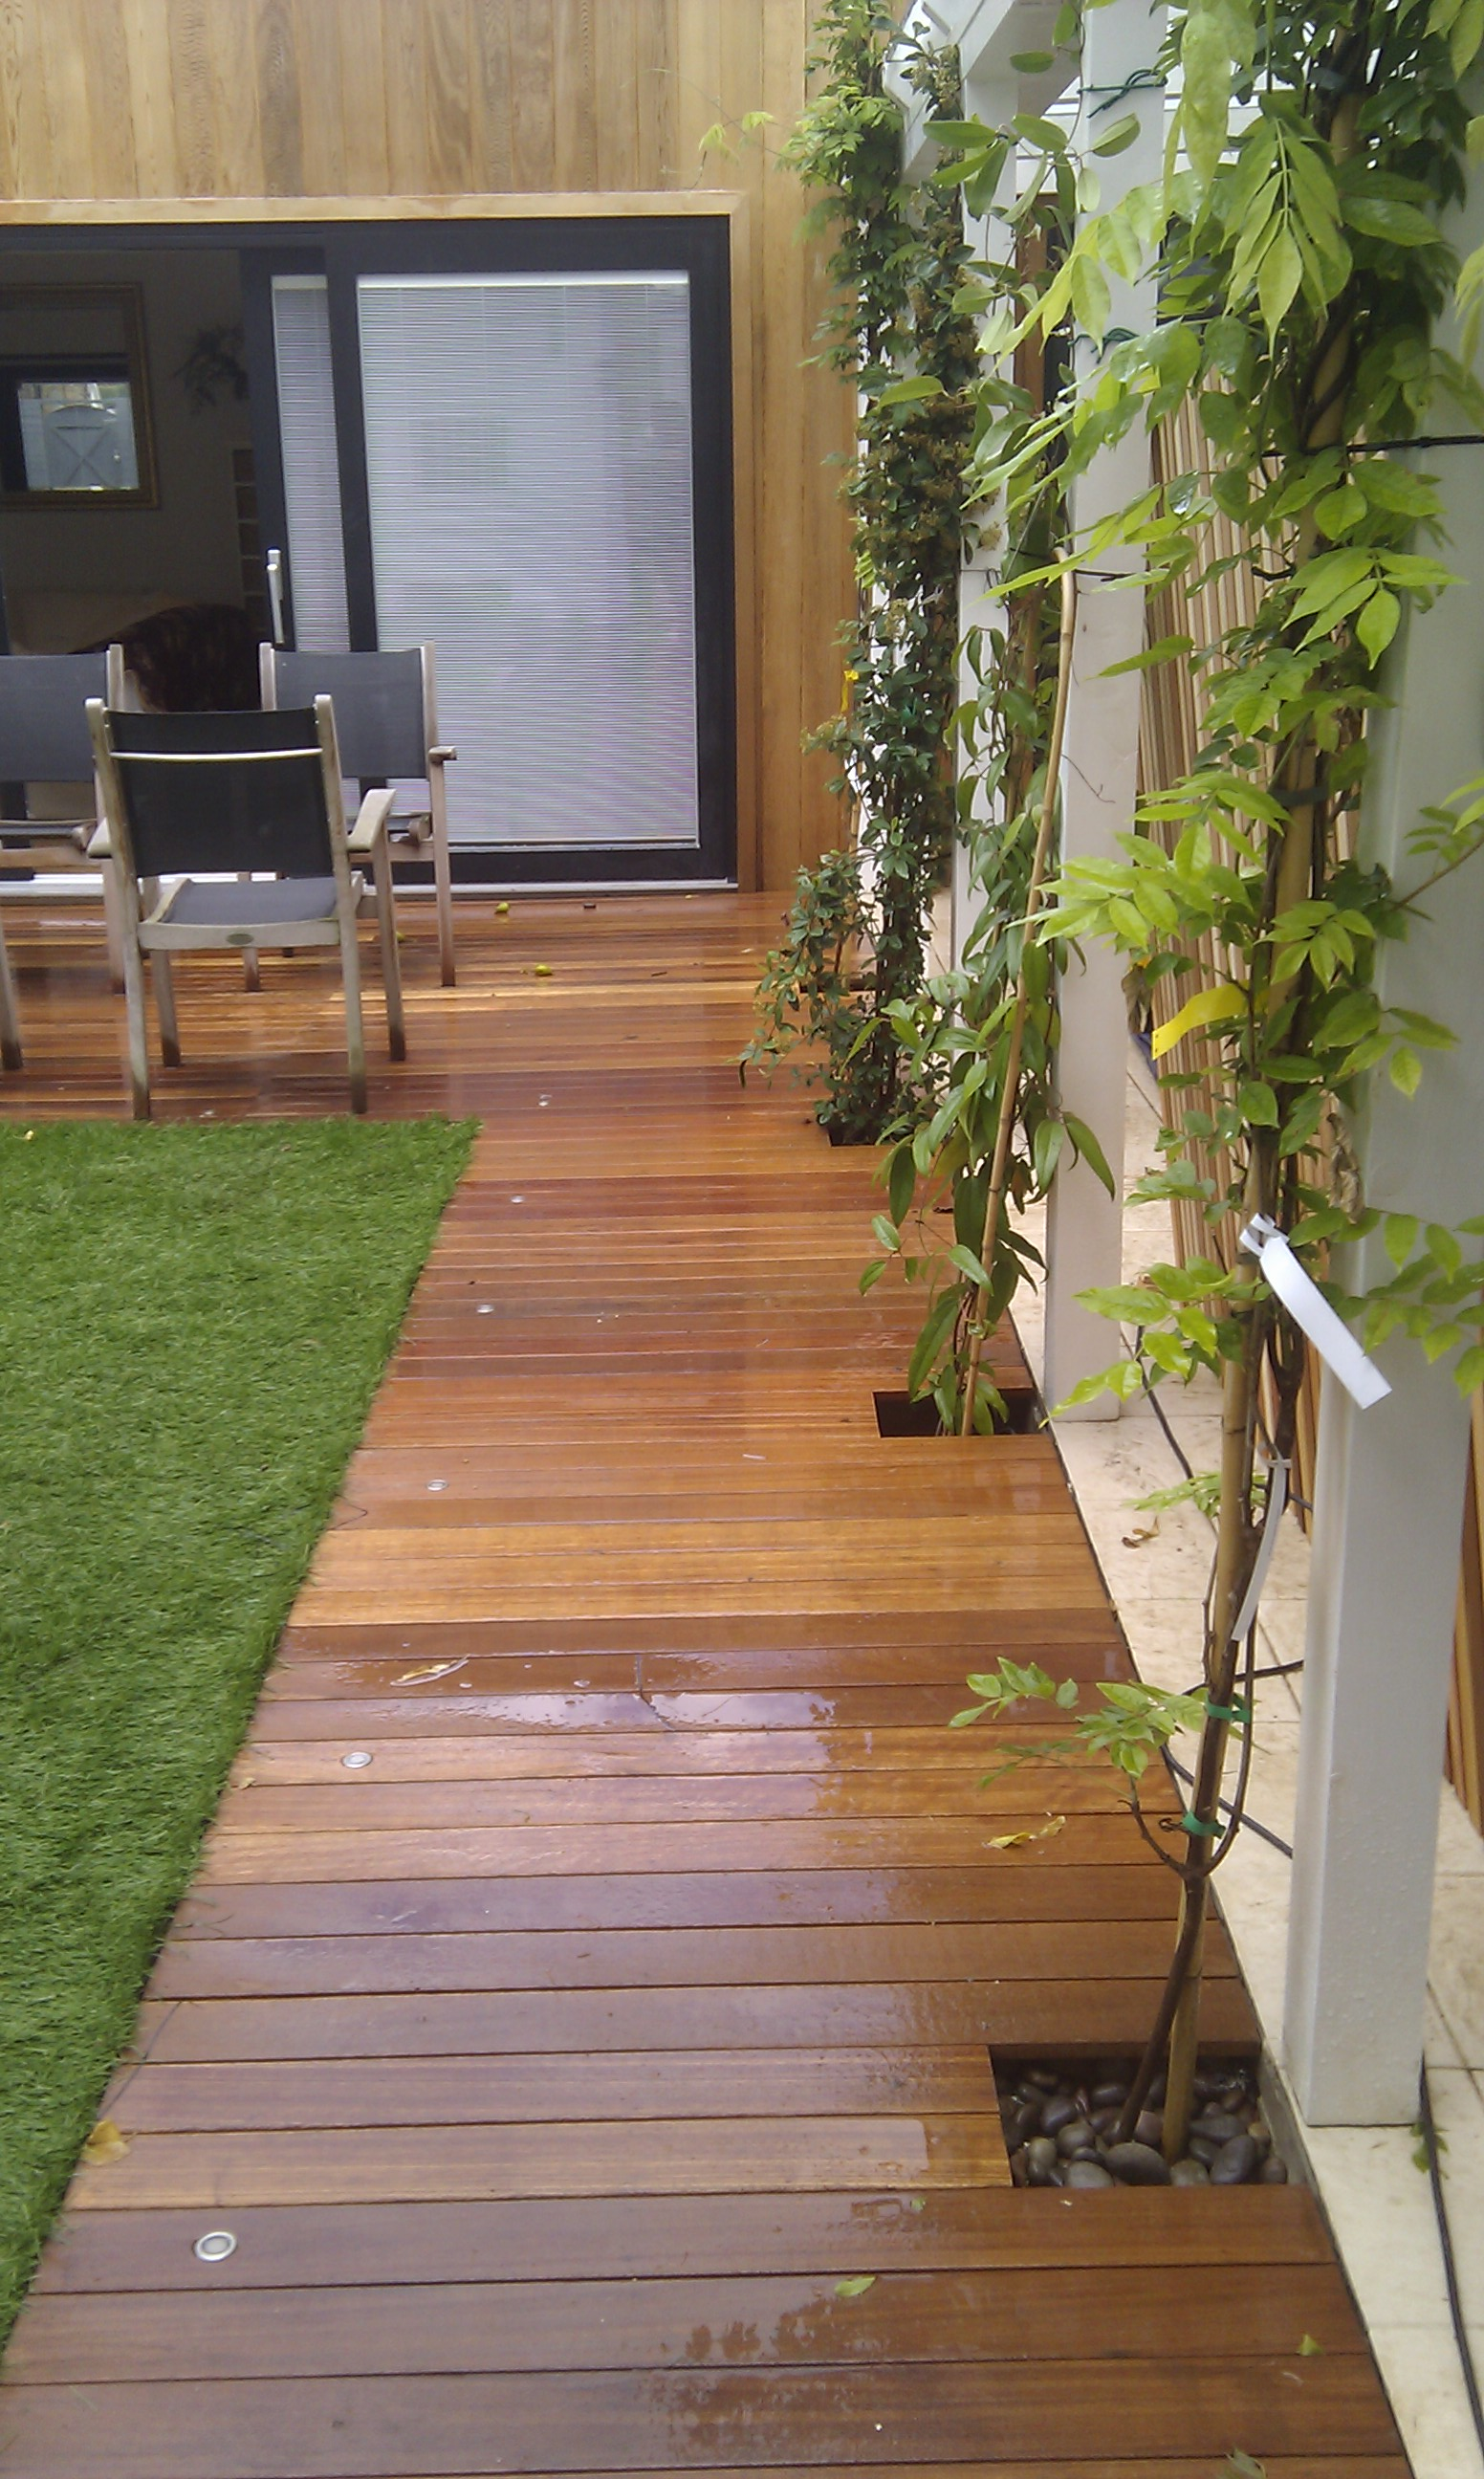 modern garden design london slatted grey privacy screen sandstone paving easy grass balau hardwood decking (18)